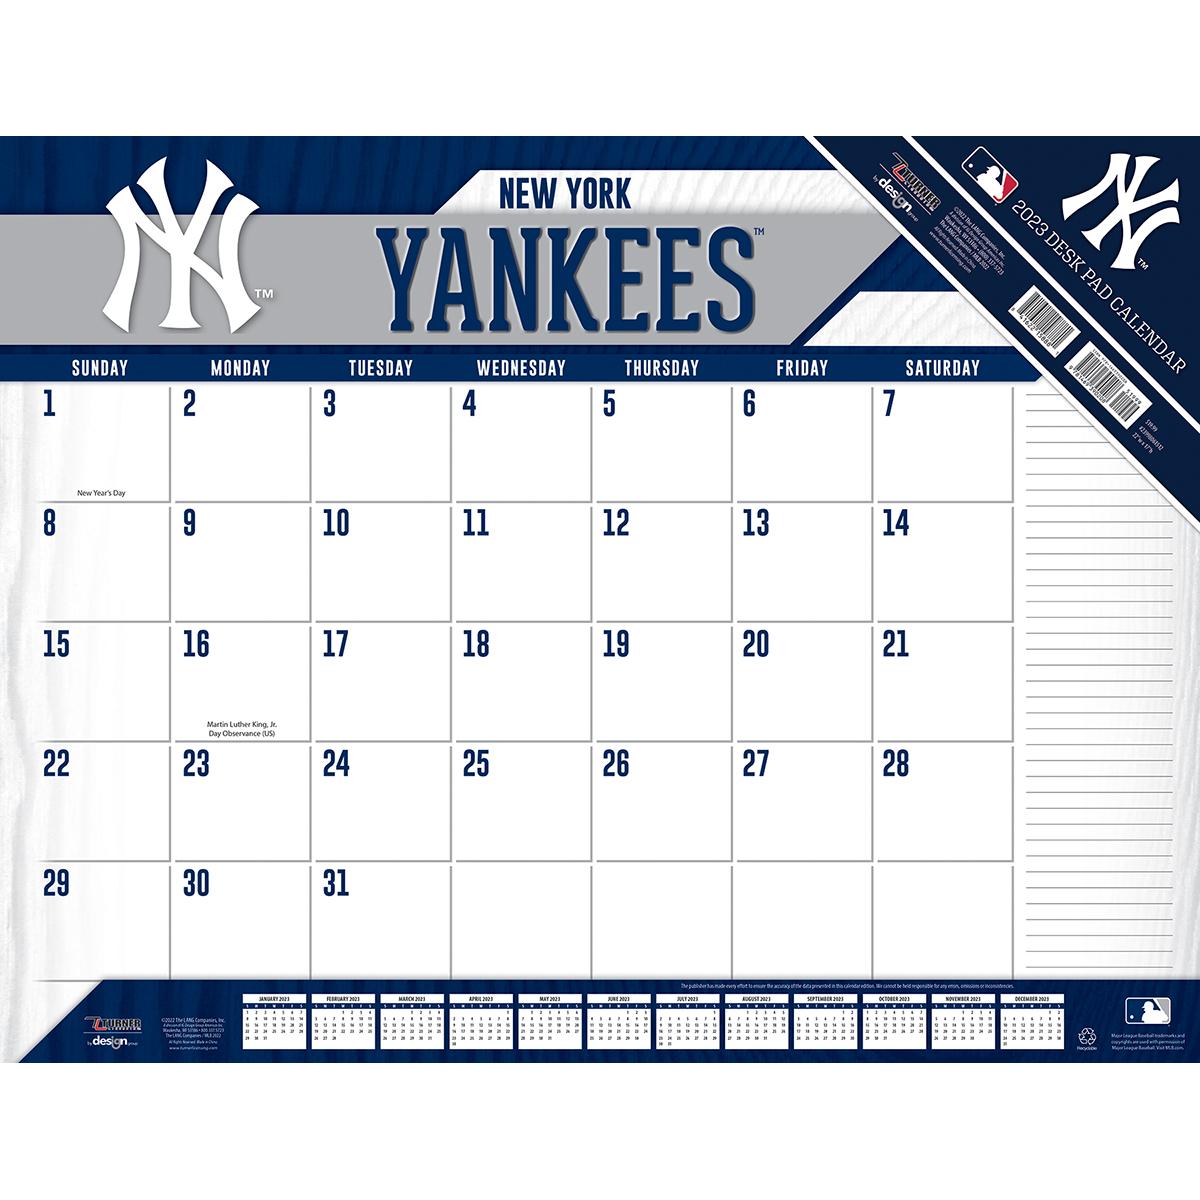 New York Yankees 2018 Mlb 22 X 17 Desk Calendar Buy At